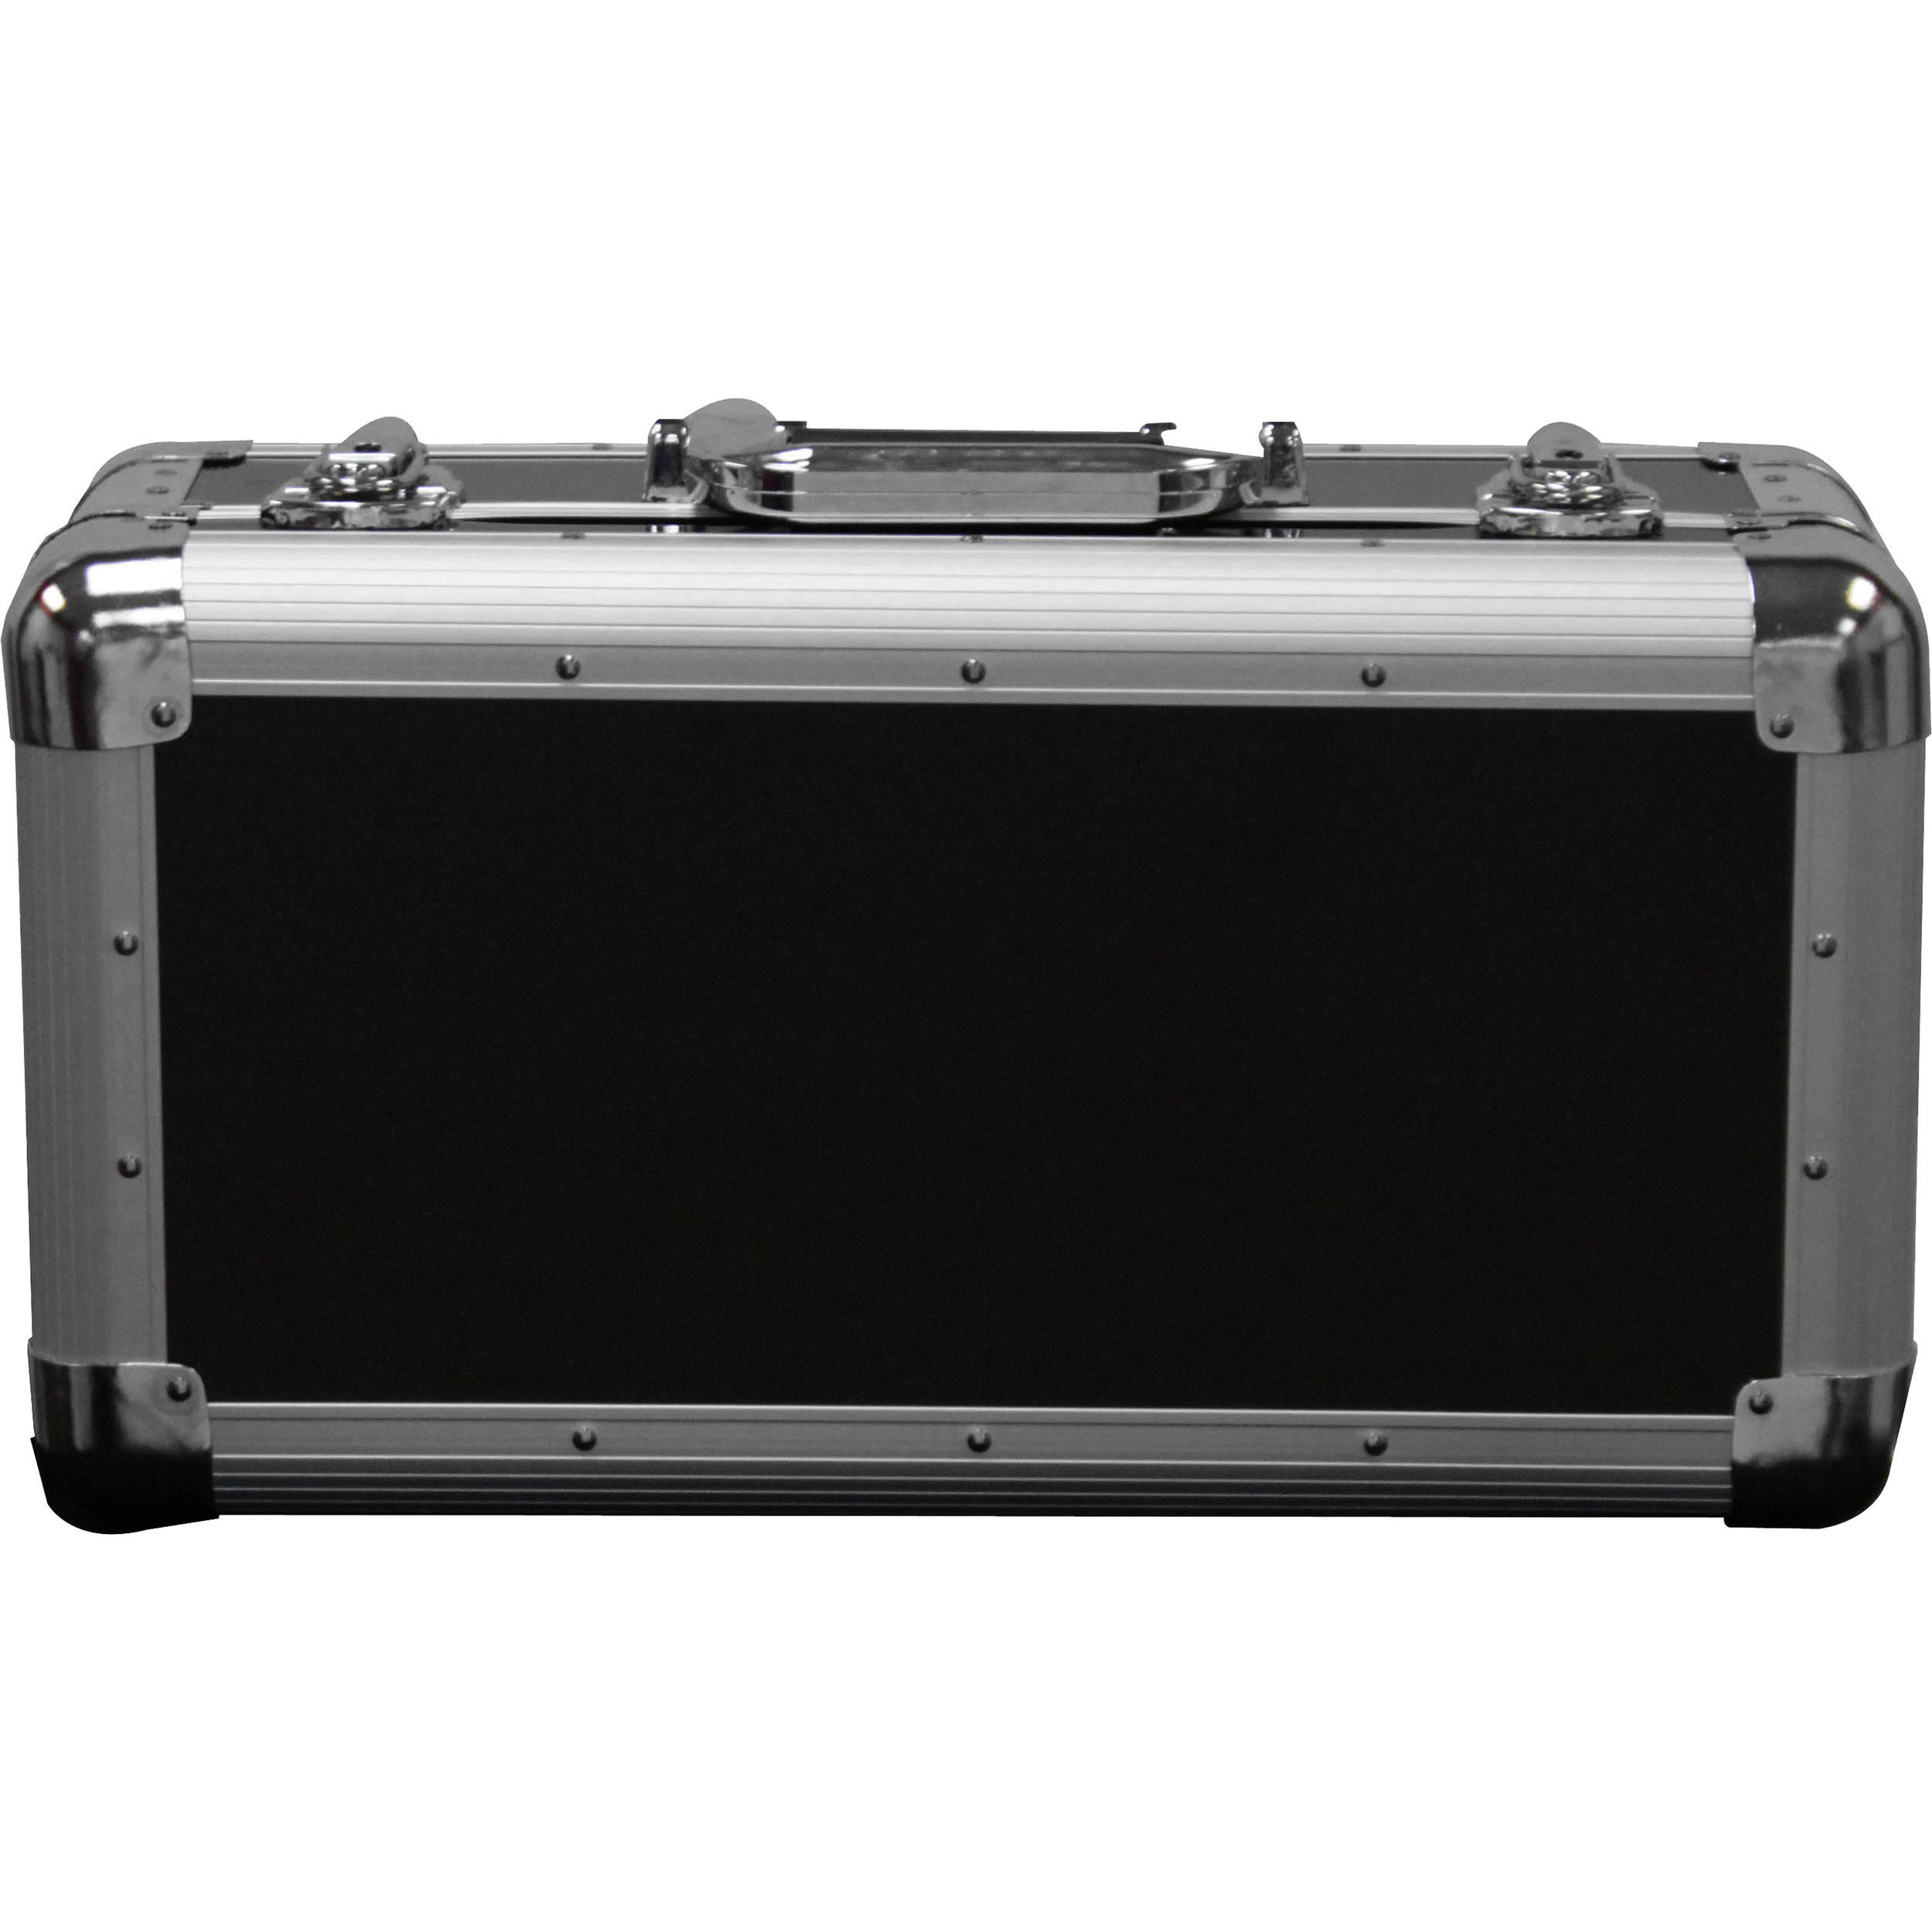 Odyssey KCD200BLK Black Krom Case For 200 View Packs